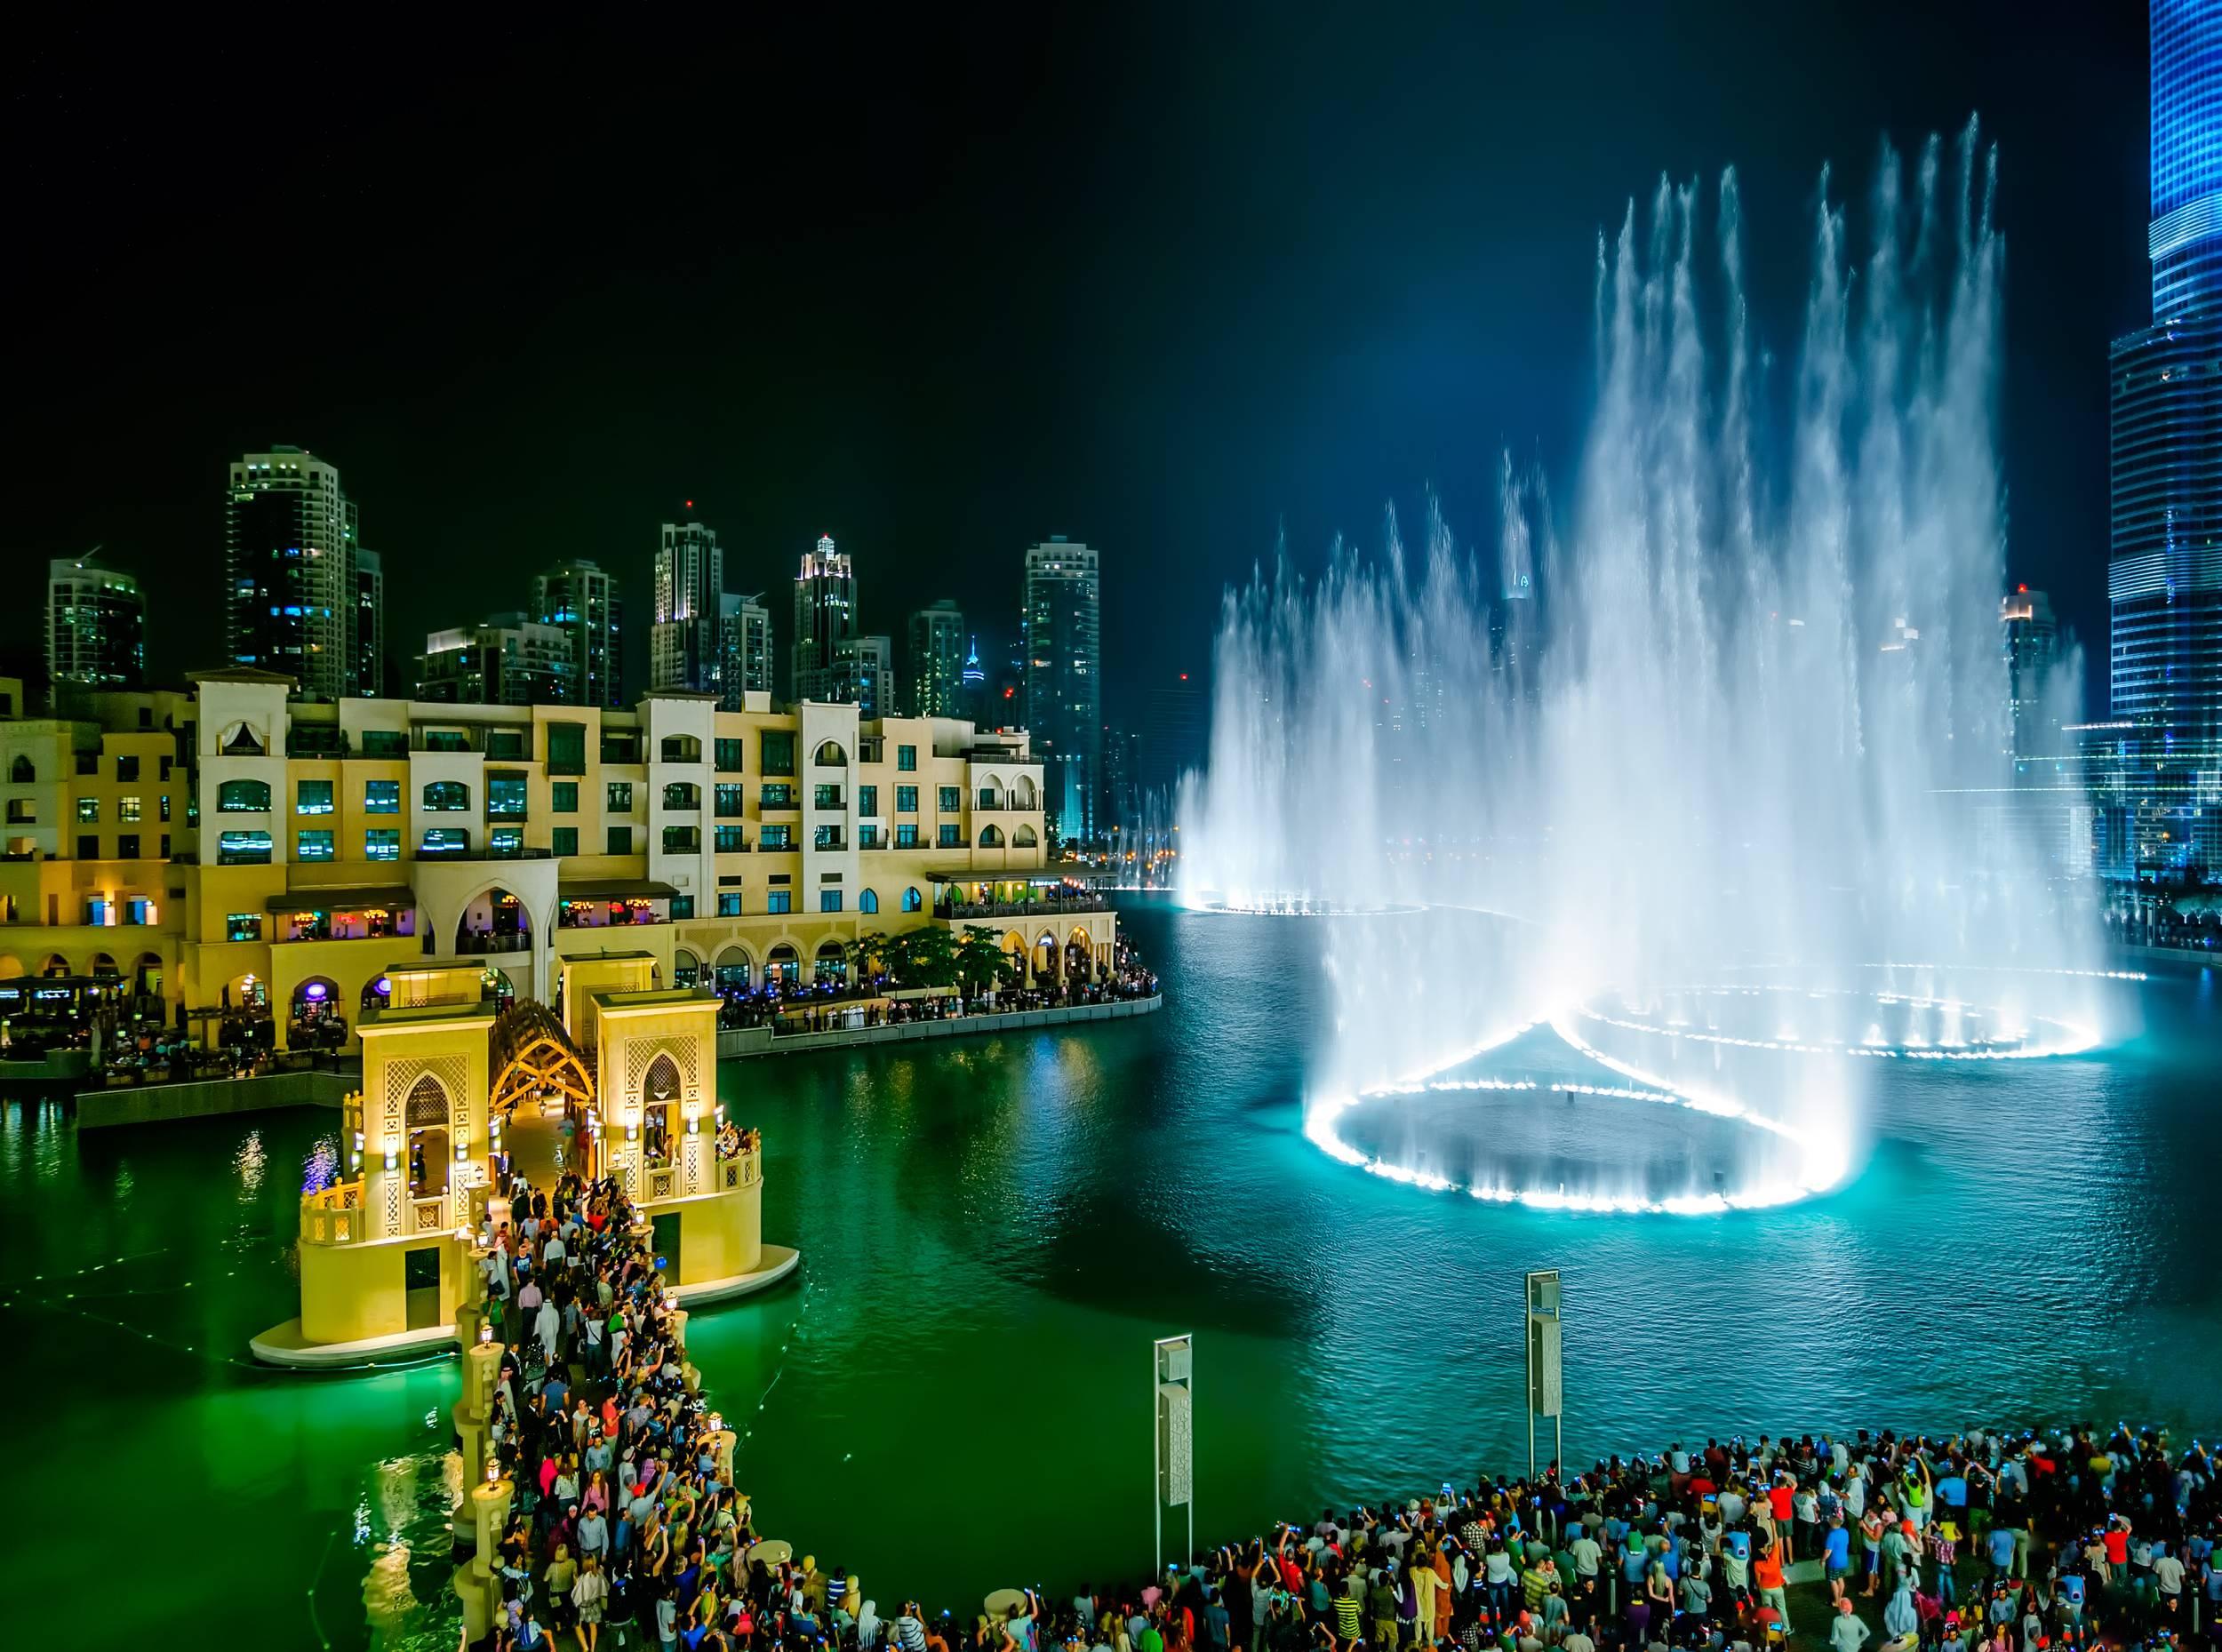 Canva - Dubai fountain view near Burj Khalifa, Dubai, United Arab Emirates